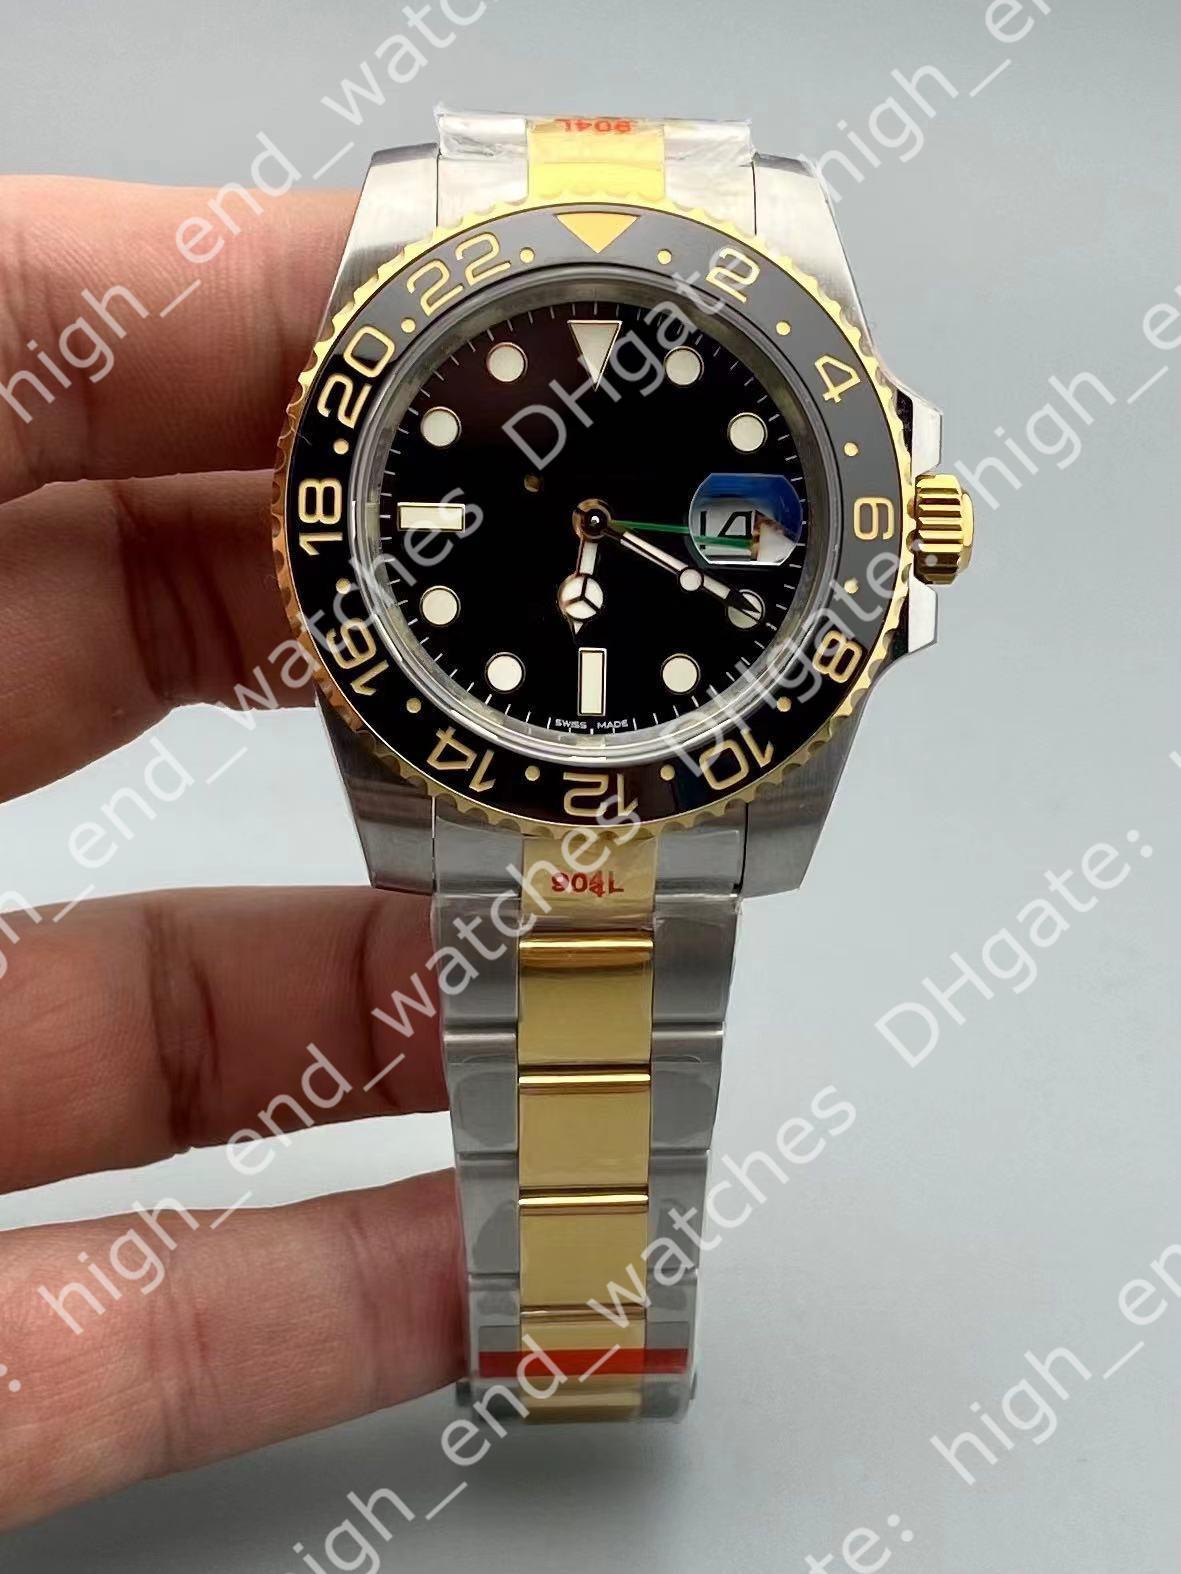 N V11 men's watches 40x13mm GMT 3186 automatic mechanical movement Montre DE Luxe 904L bidirectional ceramic rotating bezel Luxury Watch